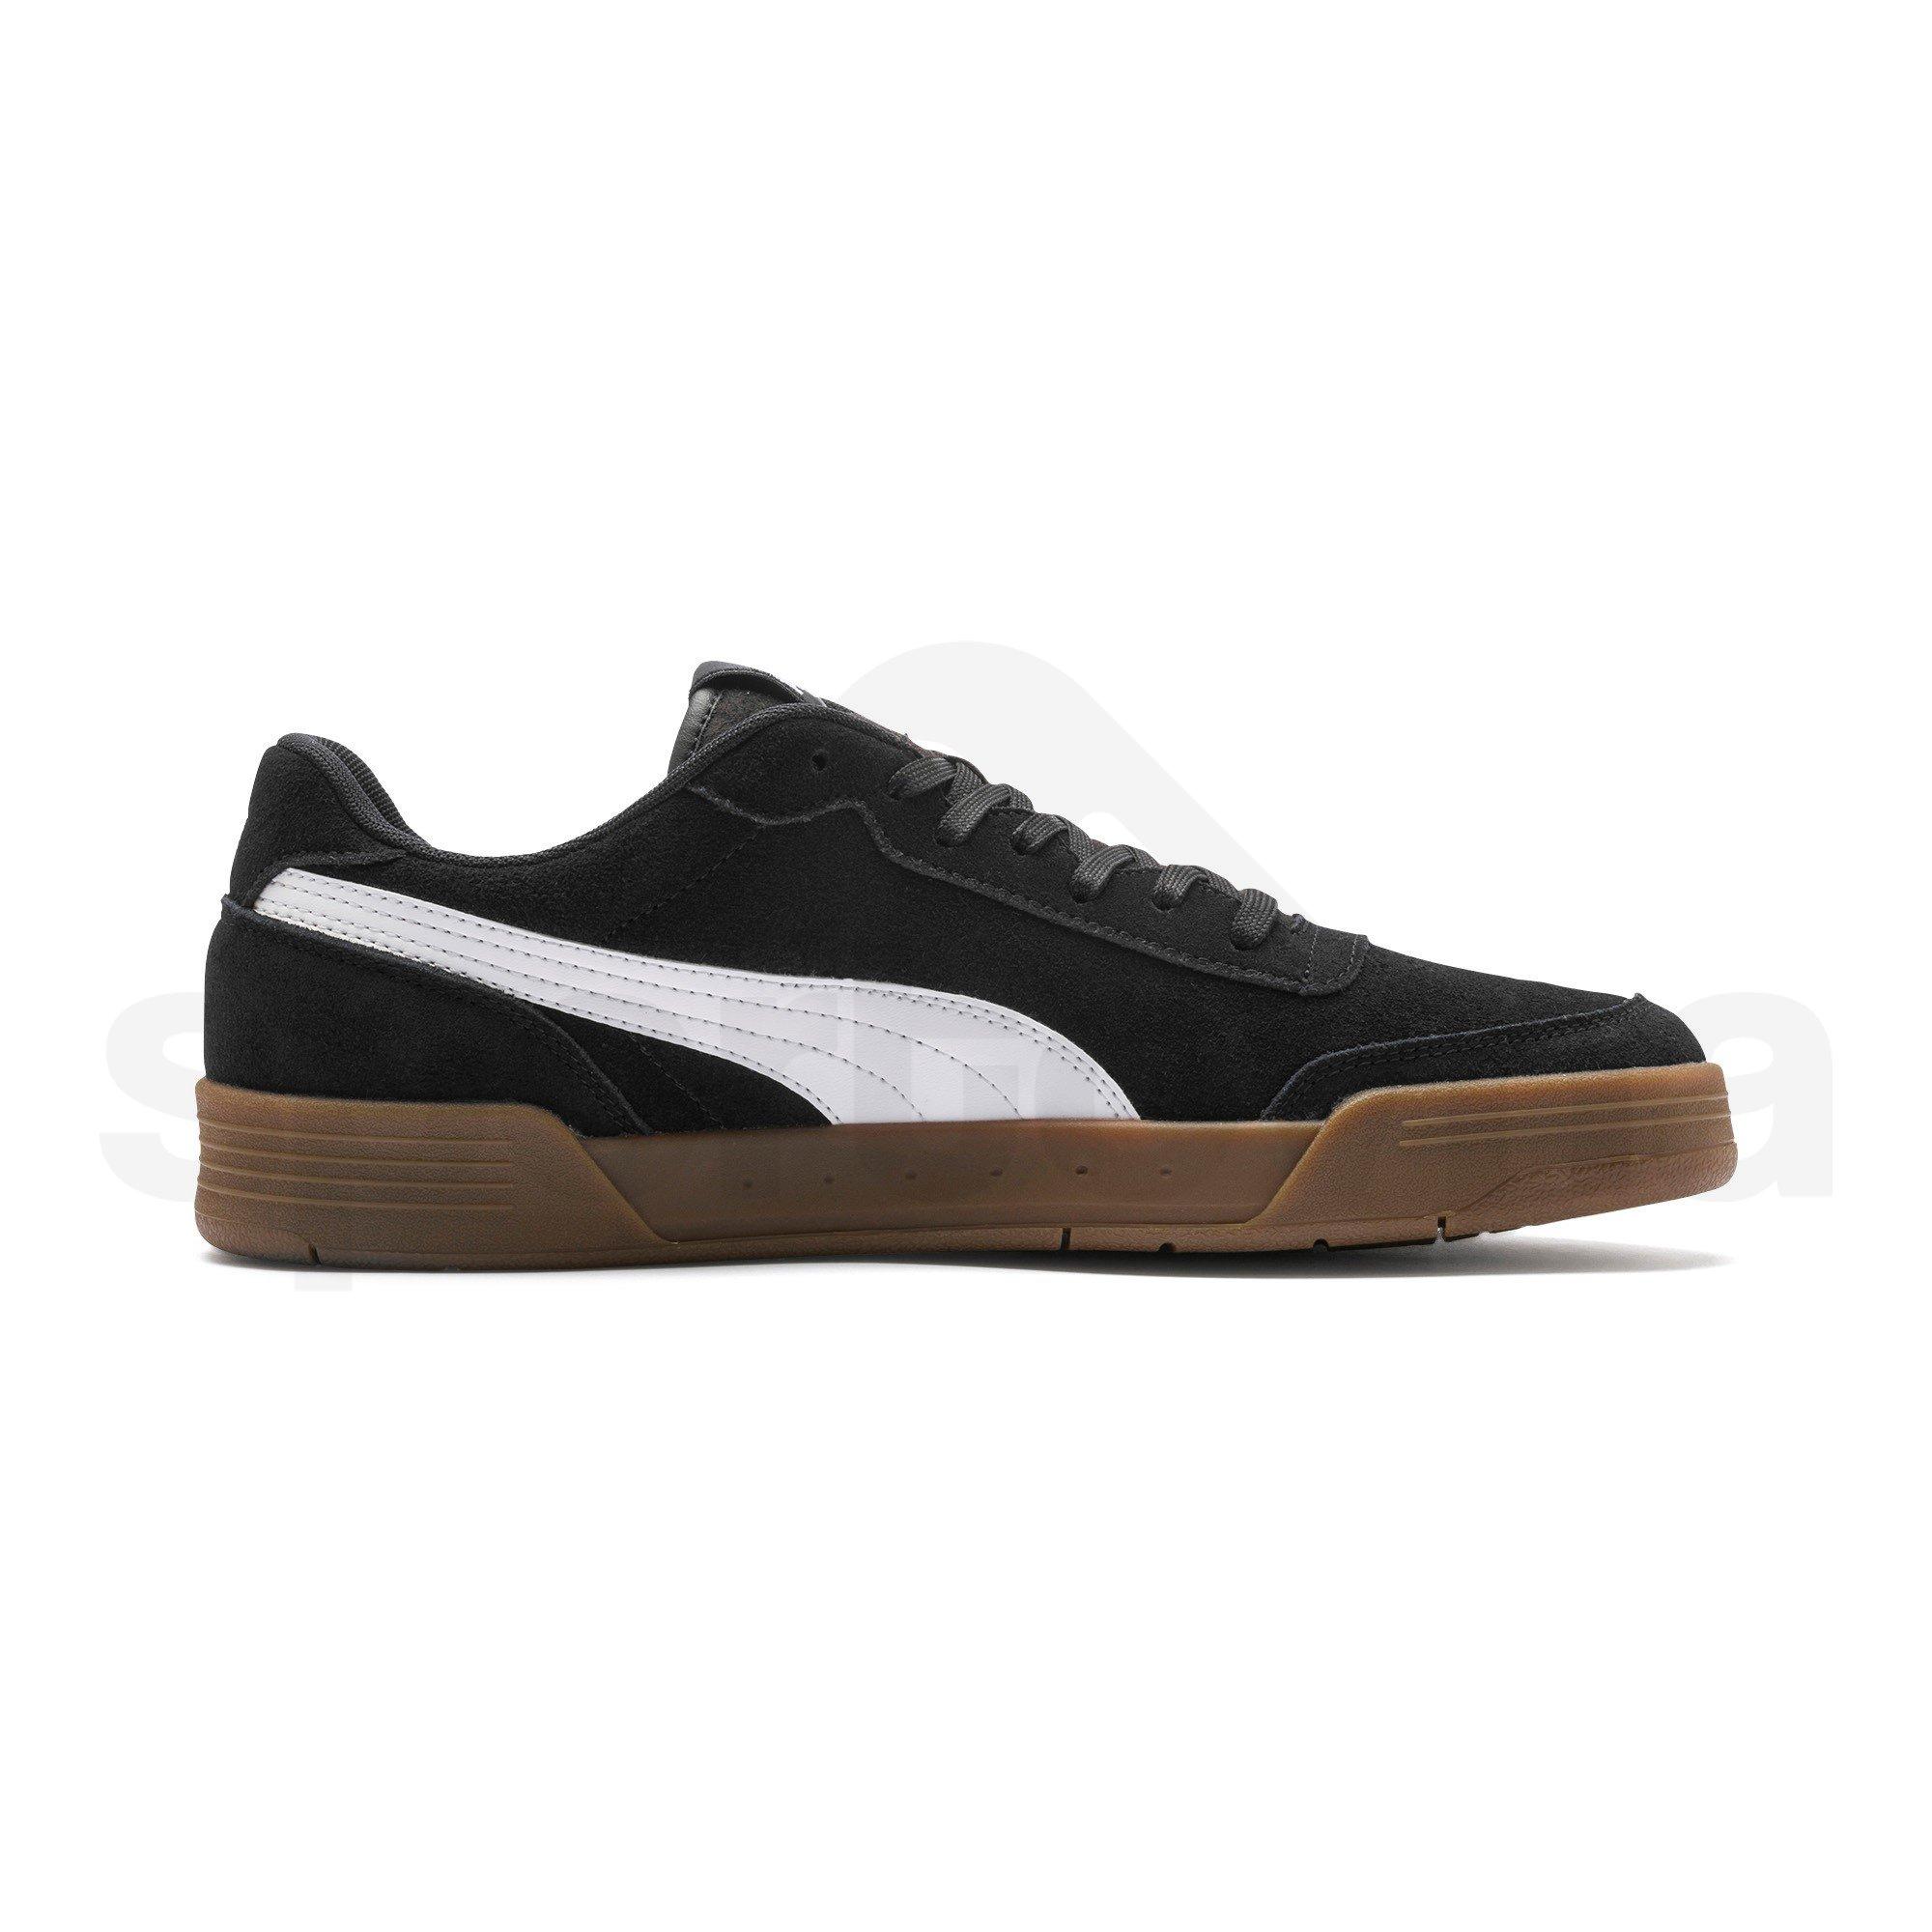 Pánská sportovní obuv Puma Caracal SD Black - 37030405 ...